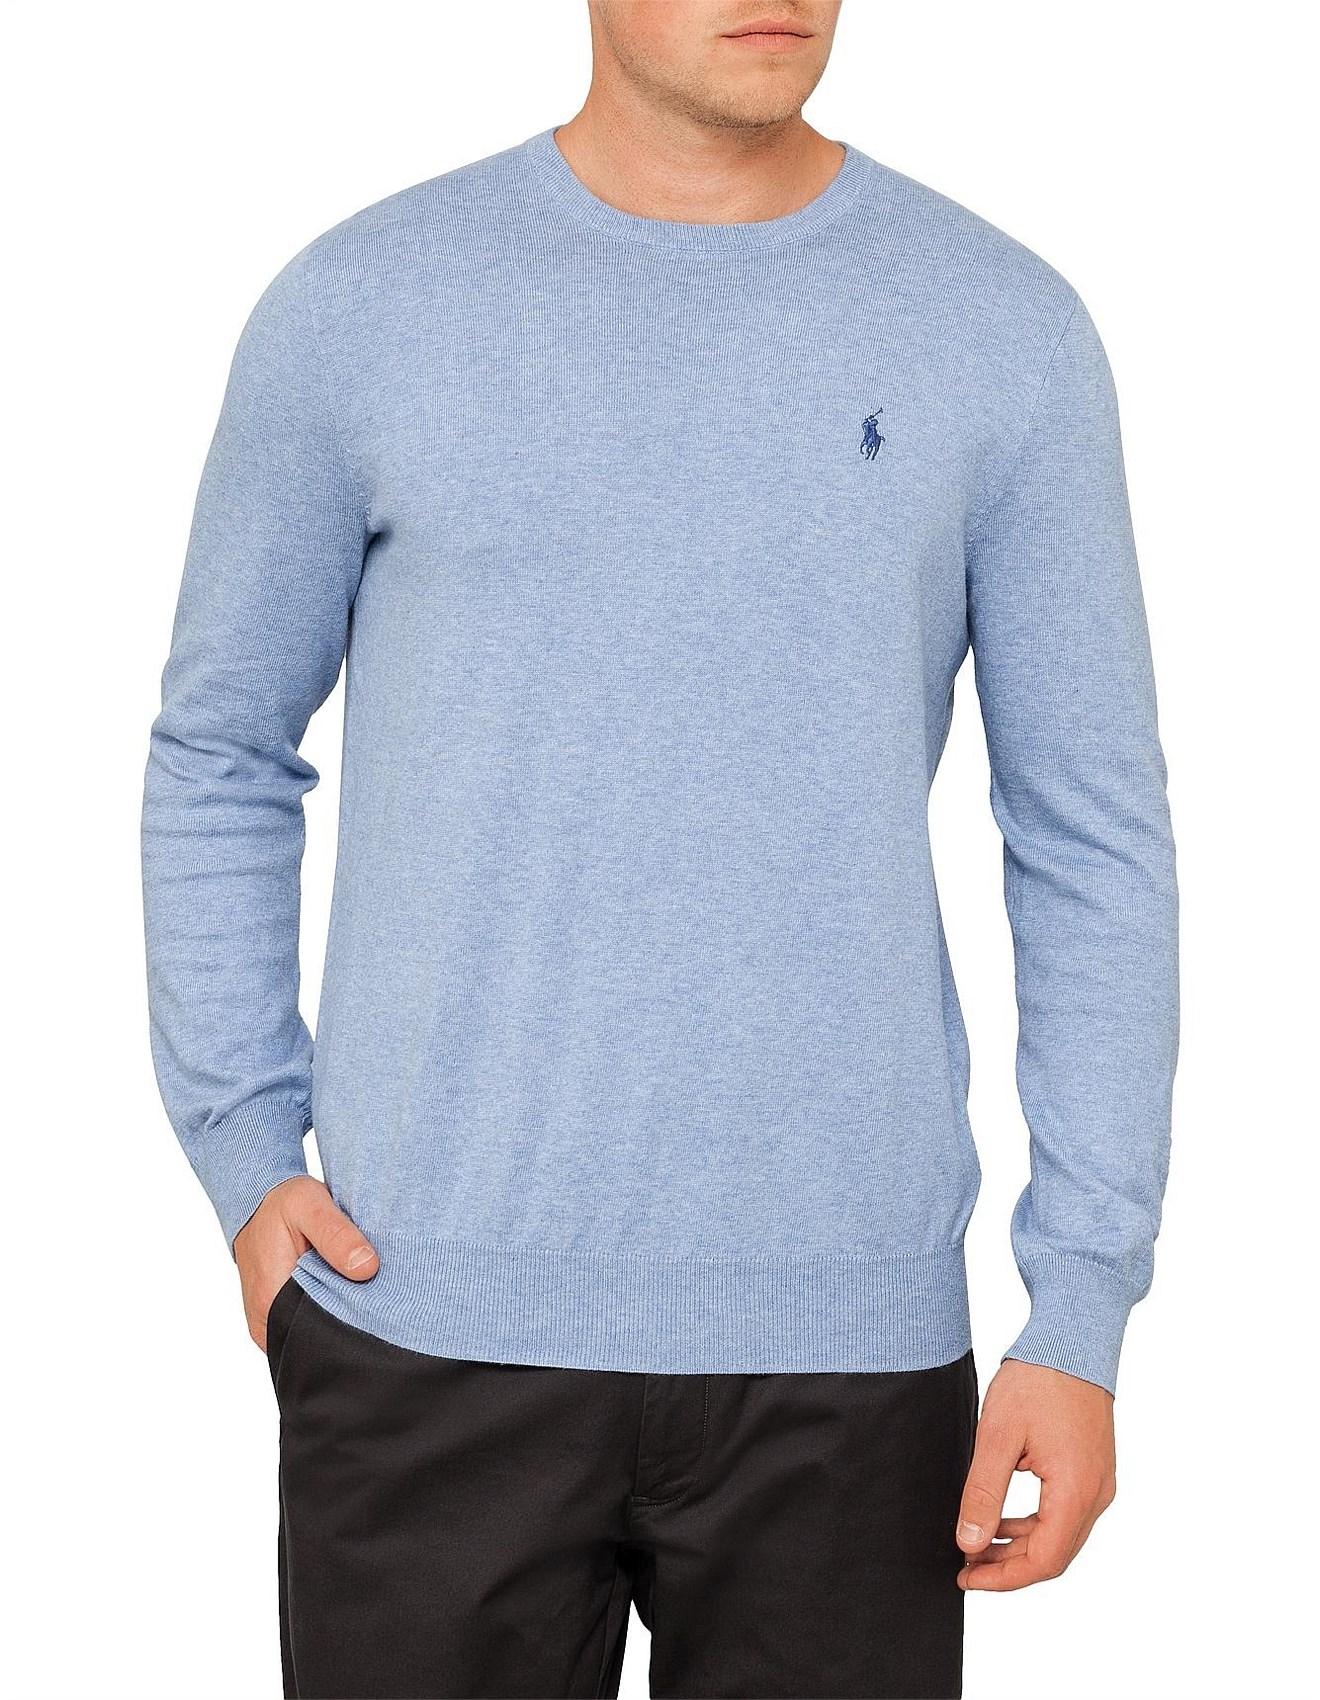 193bec8e Mens Long Sleeve Pima Cotton Sweater. 1; 2; 3; 4. Zoom. Polo Ralph Lauren